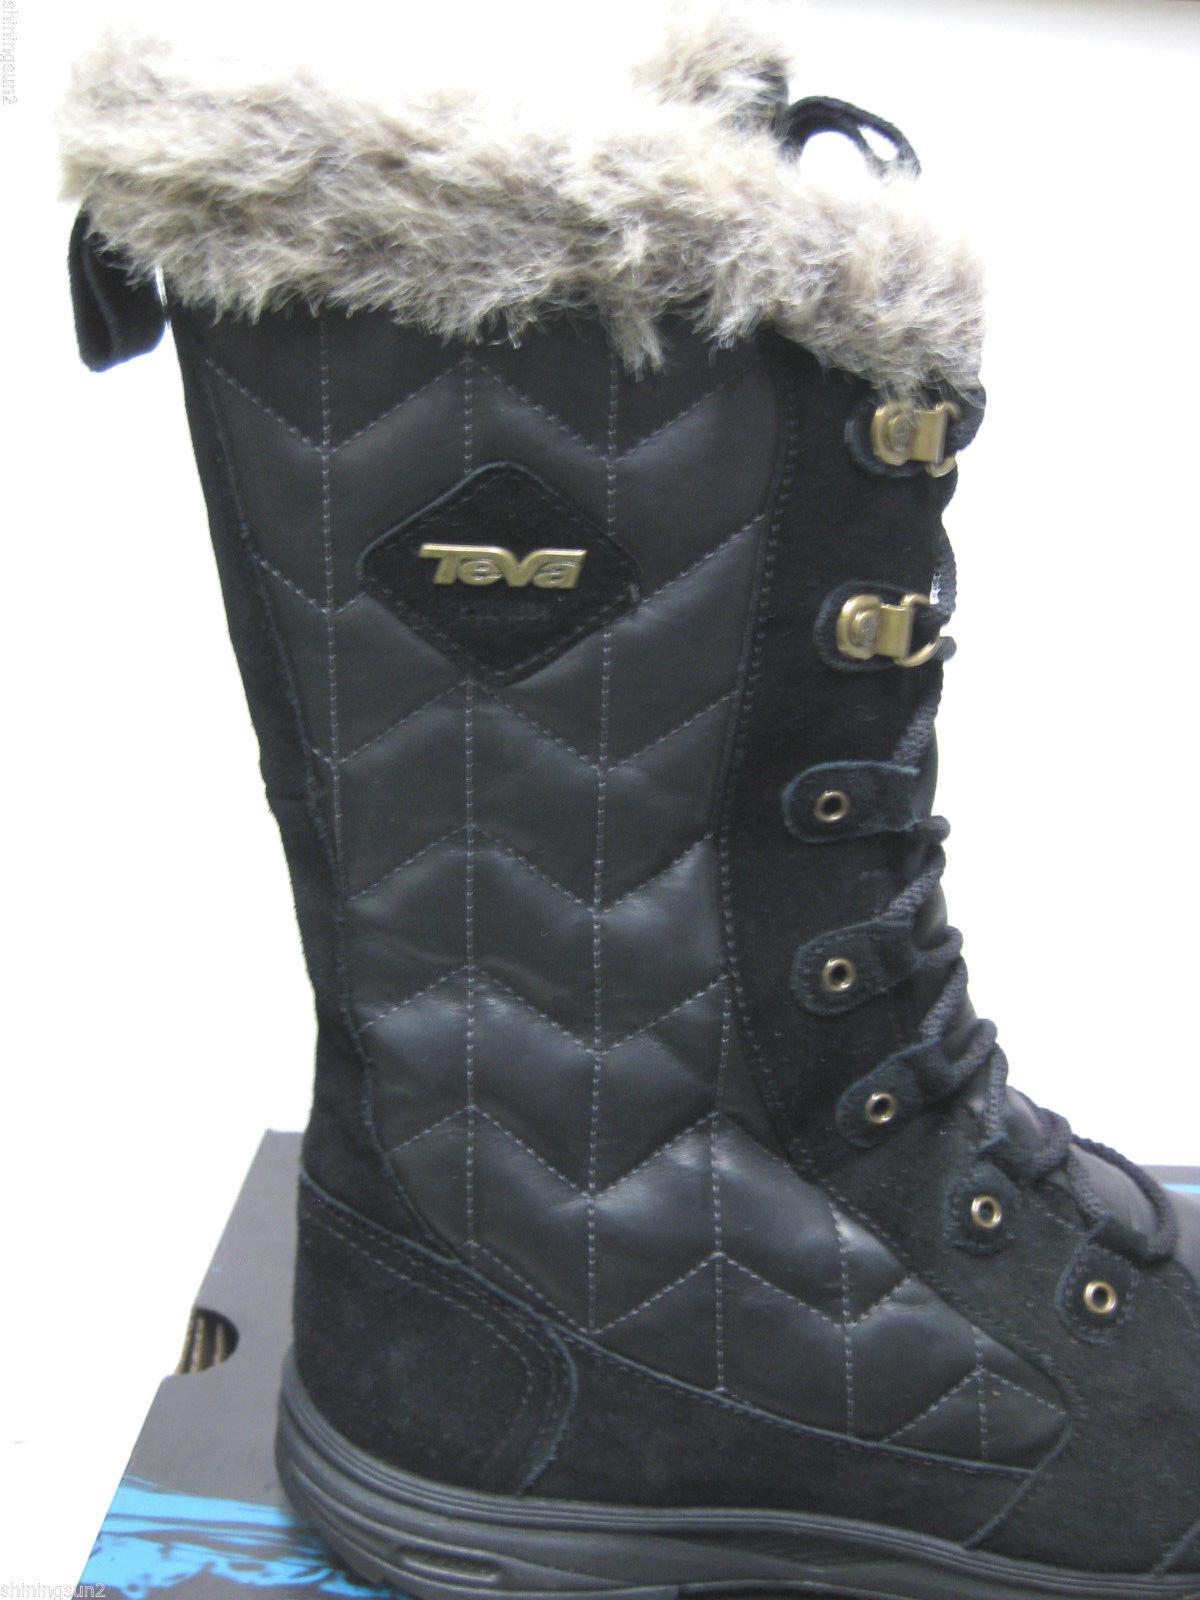 Teva Lenawee WP Black Women Boots US10 UK8 UK8 UK8 EU41 JP26.5 c16c28